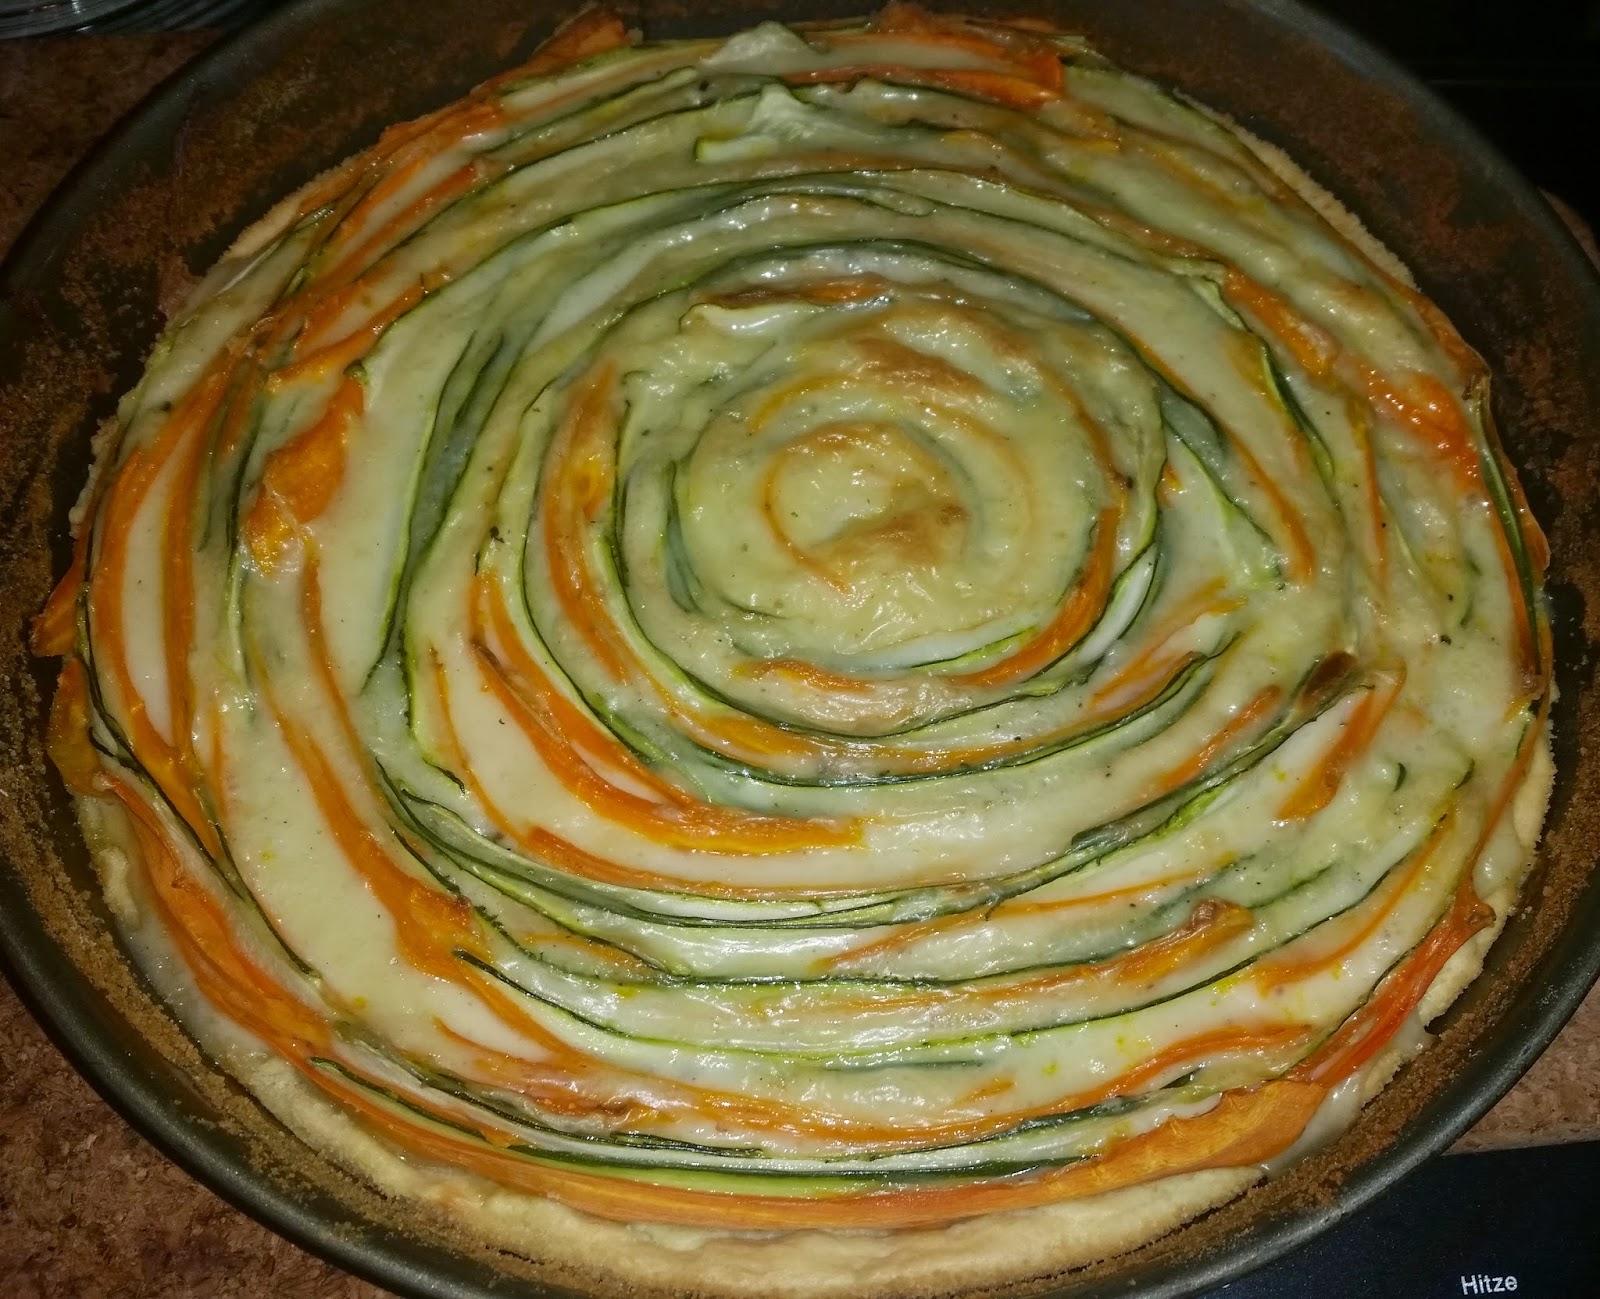 Sandy S Kitchendreams Karotten Zucchini Tarte